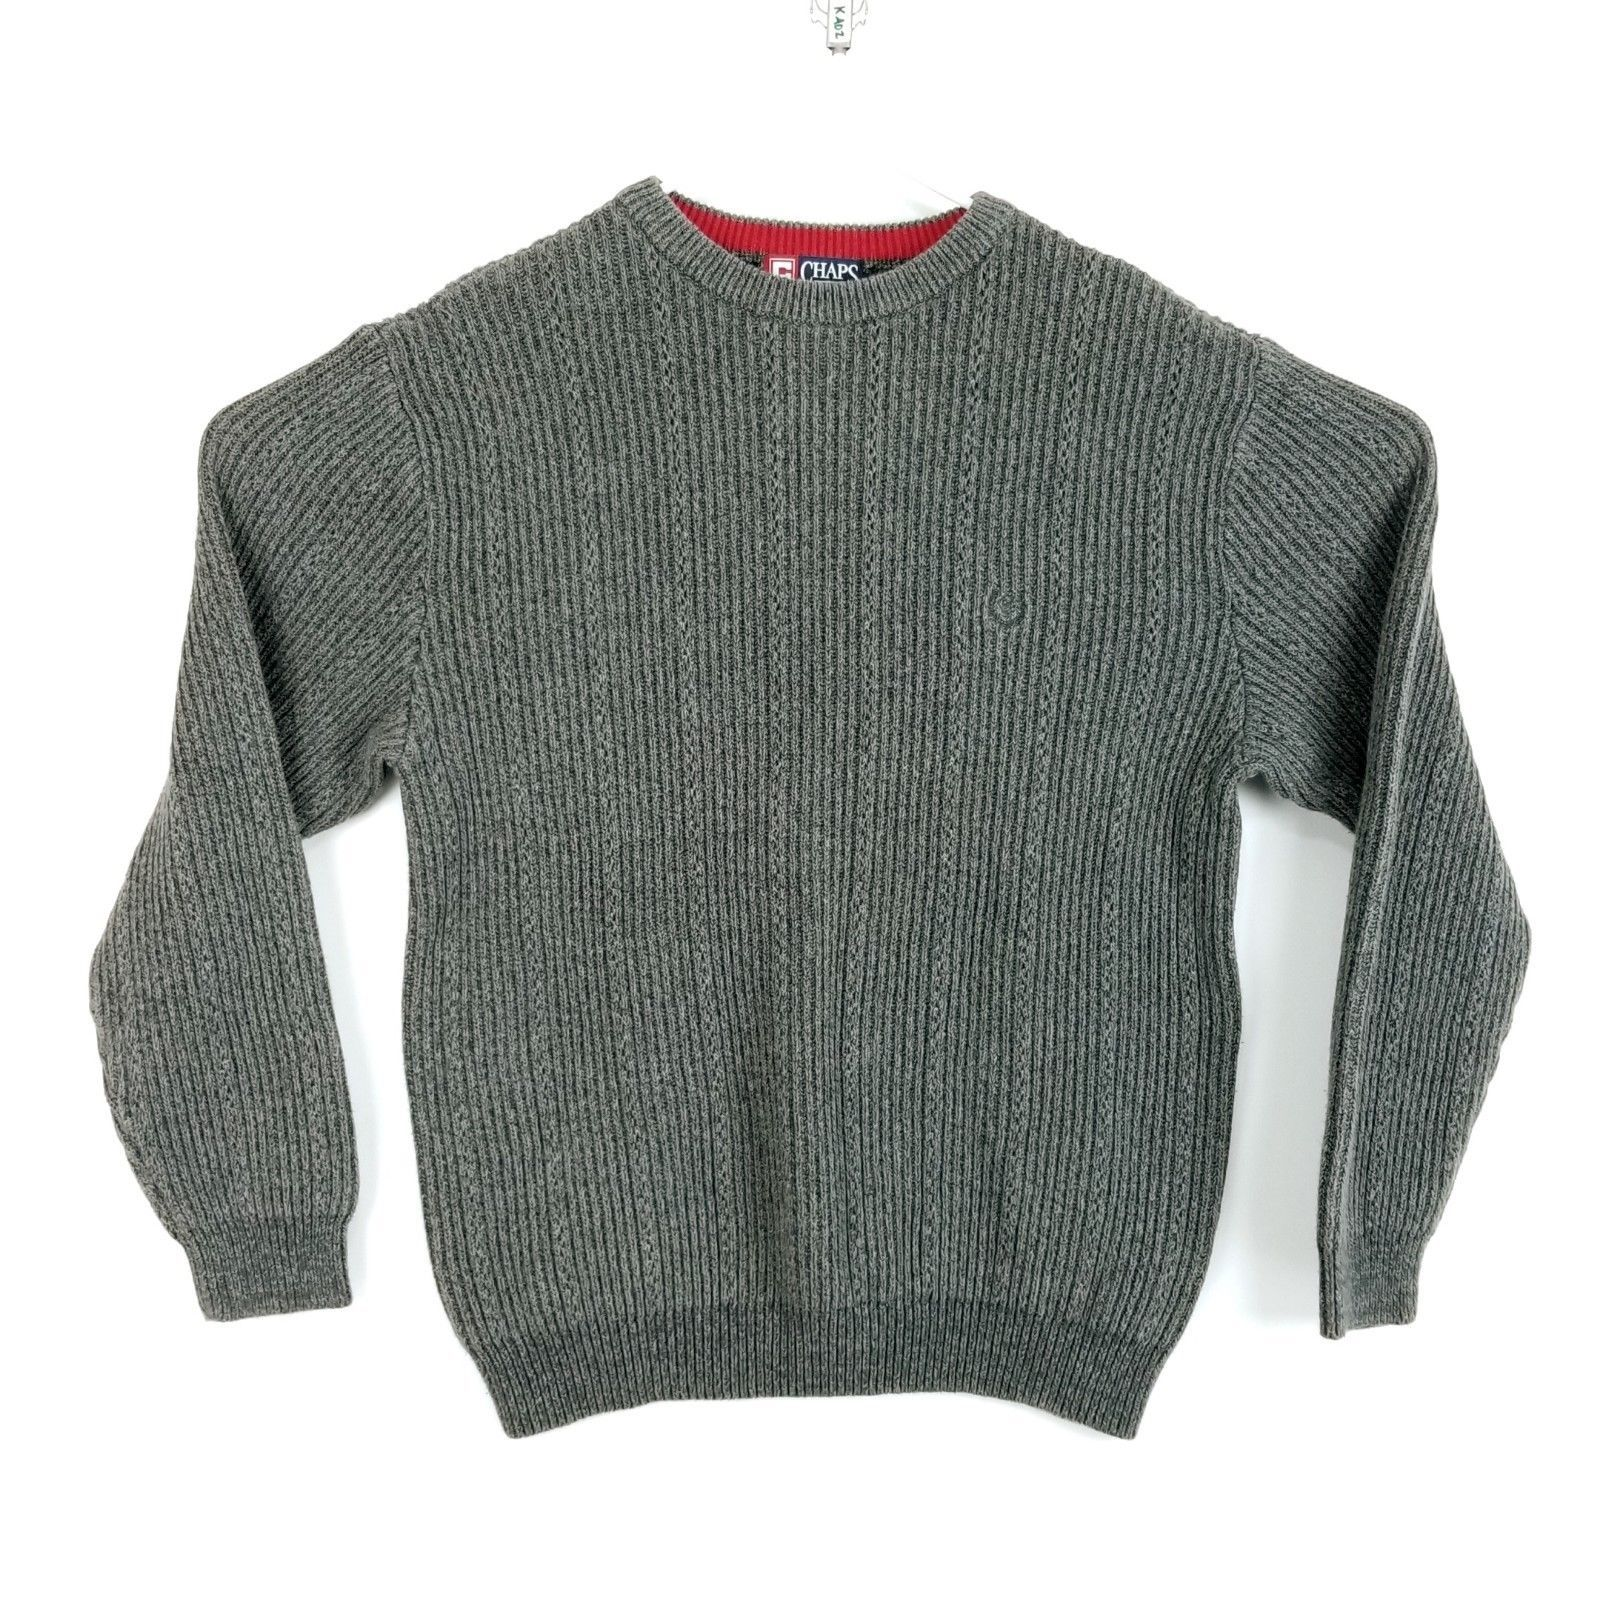 1a80ee81143 Ralph Lauren Chaps Sweater Men s Sz Large and 50 similar items